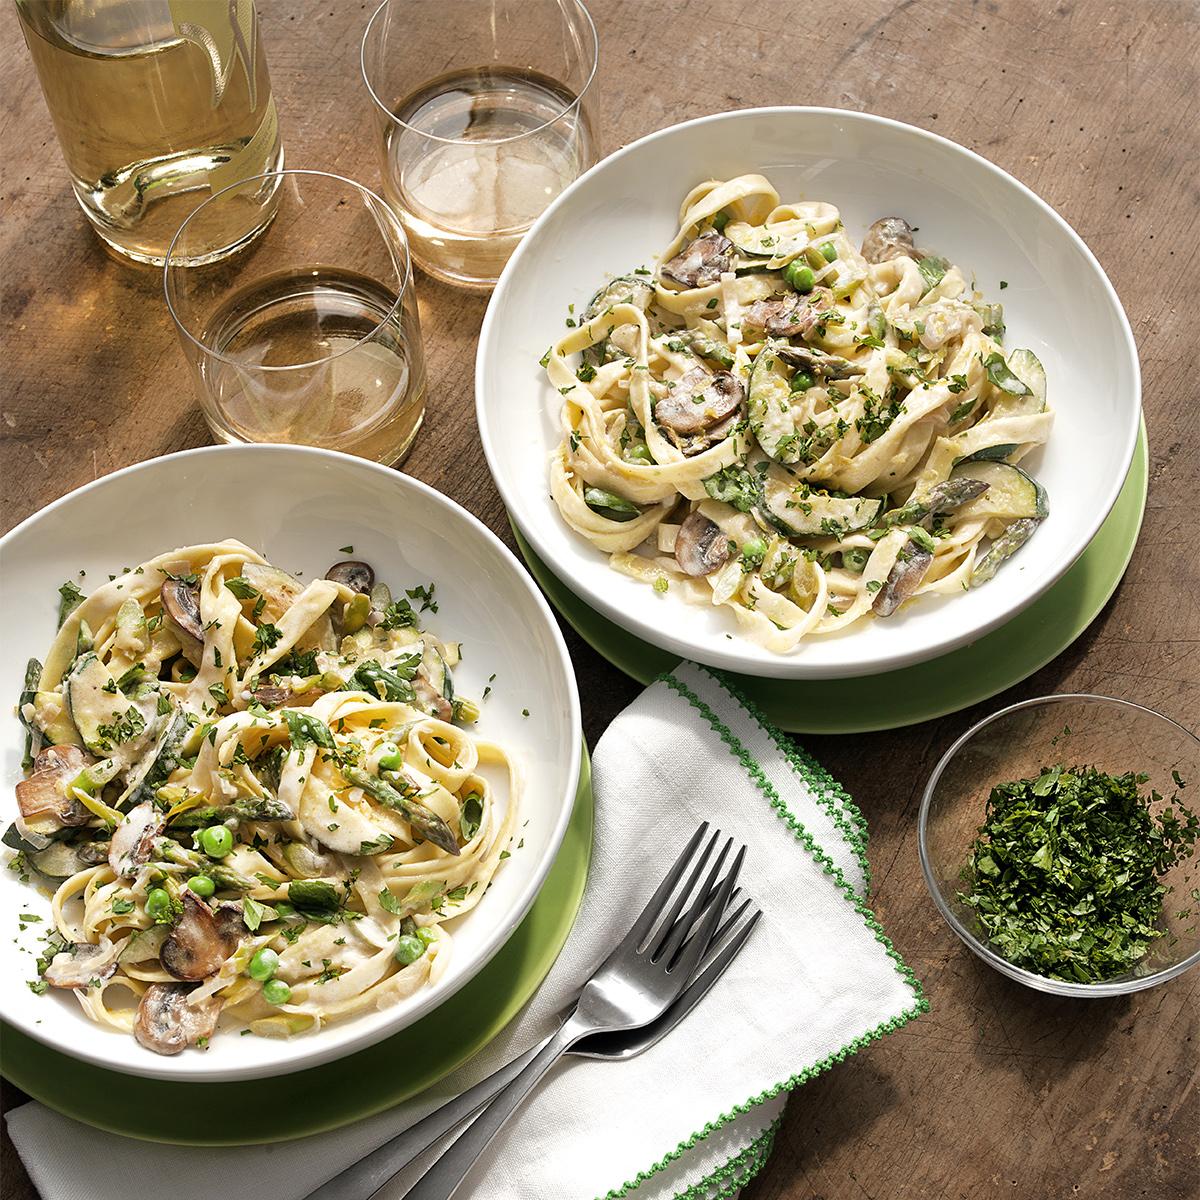 Light & Lemony Primavera with Asparagus, Zucchini and Herbs